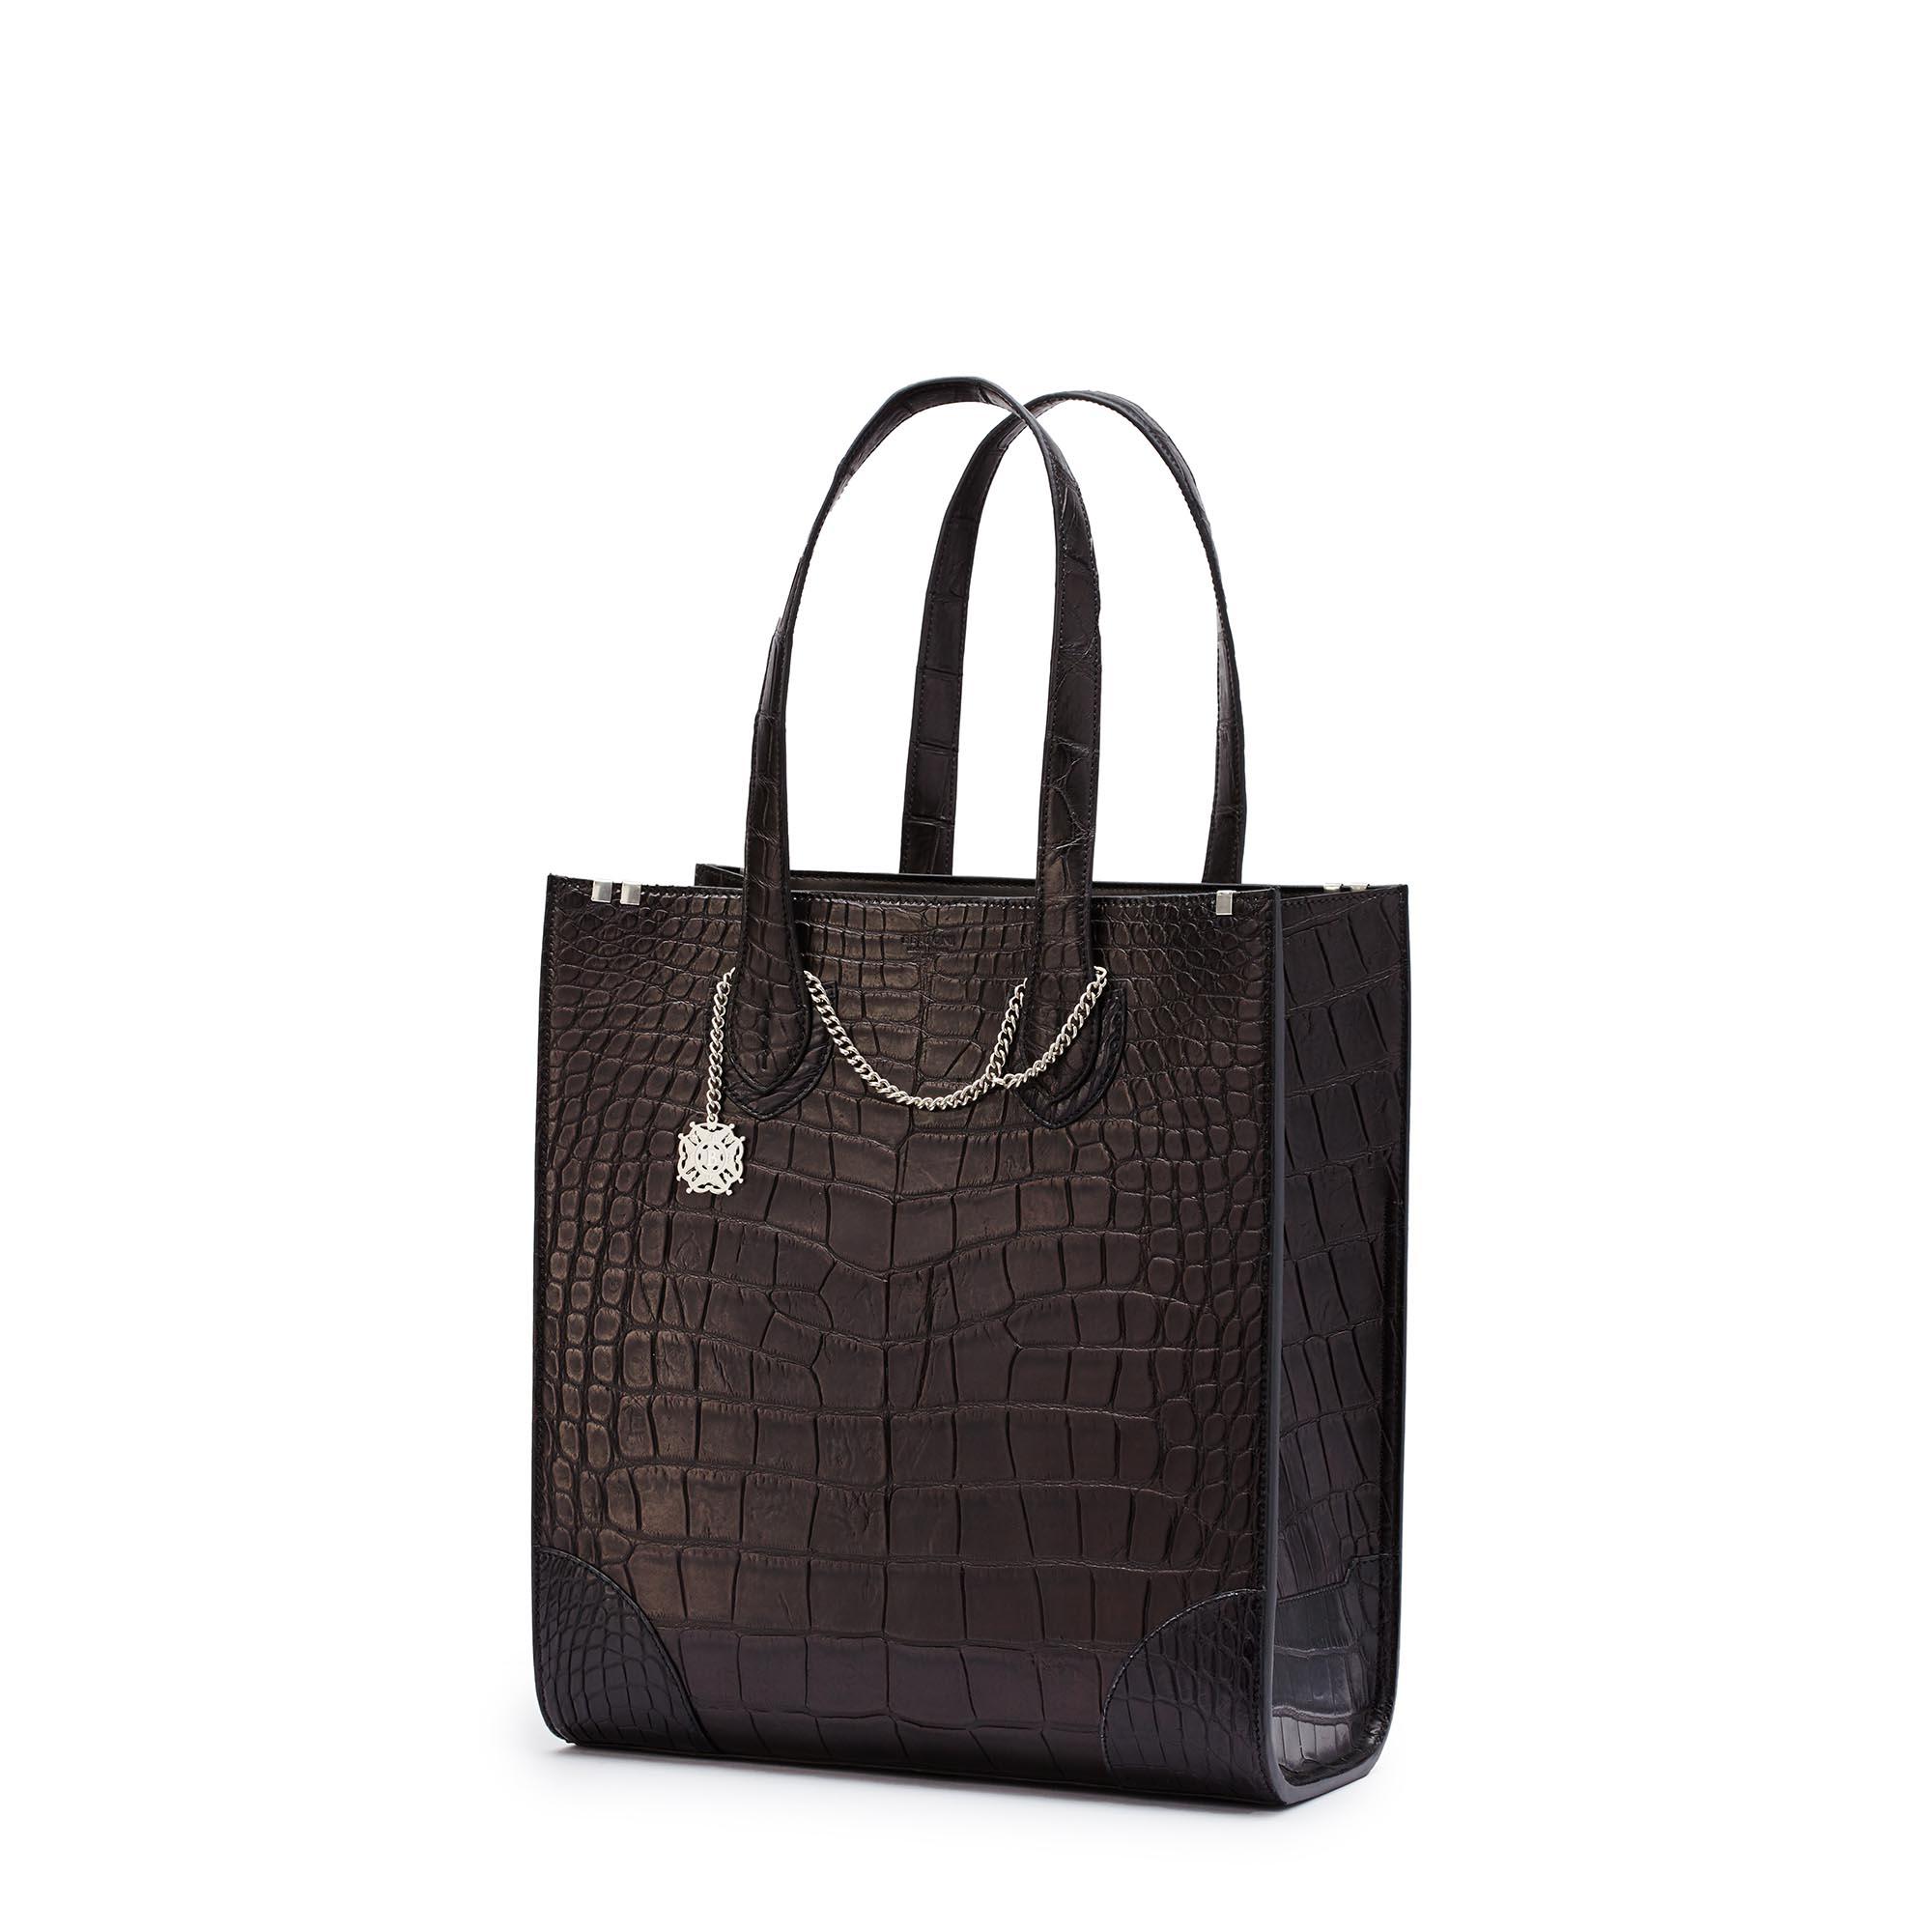 Signatura-Tote-black-alligator-bag-Bertoni-1949_02